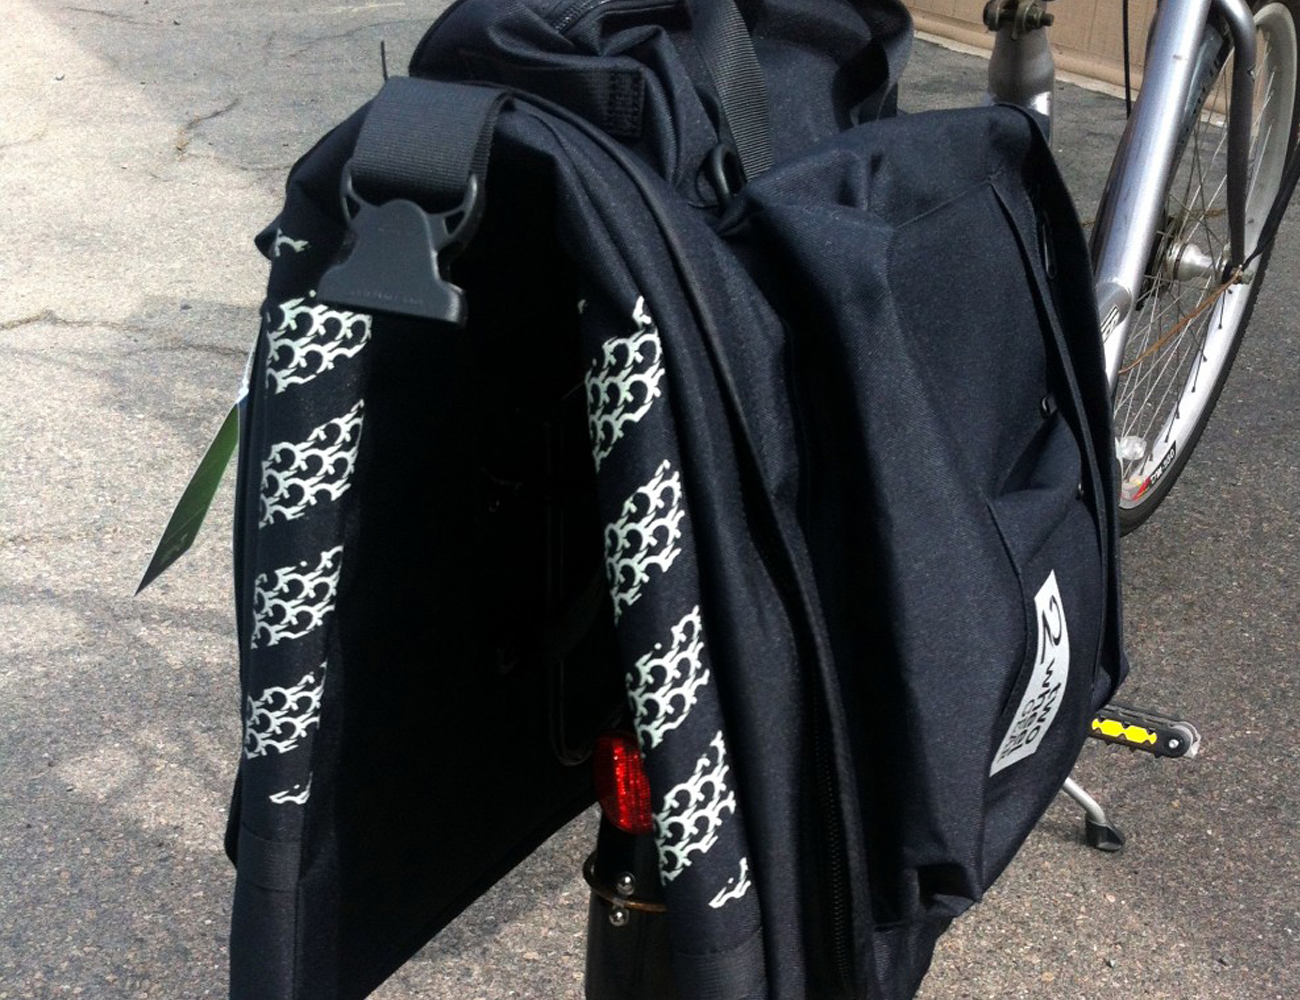 Classic 2.0 Garment Pannier by Two Wheel Gear